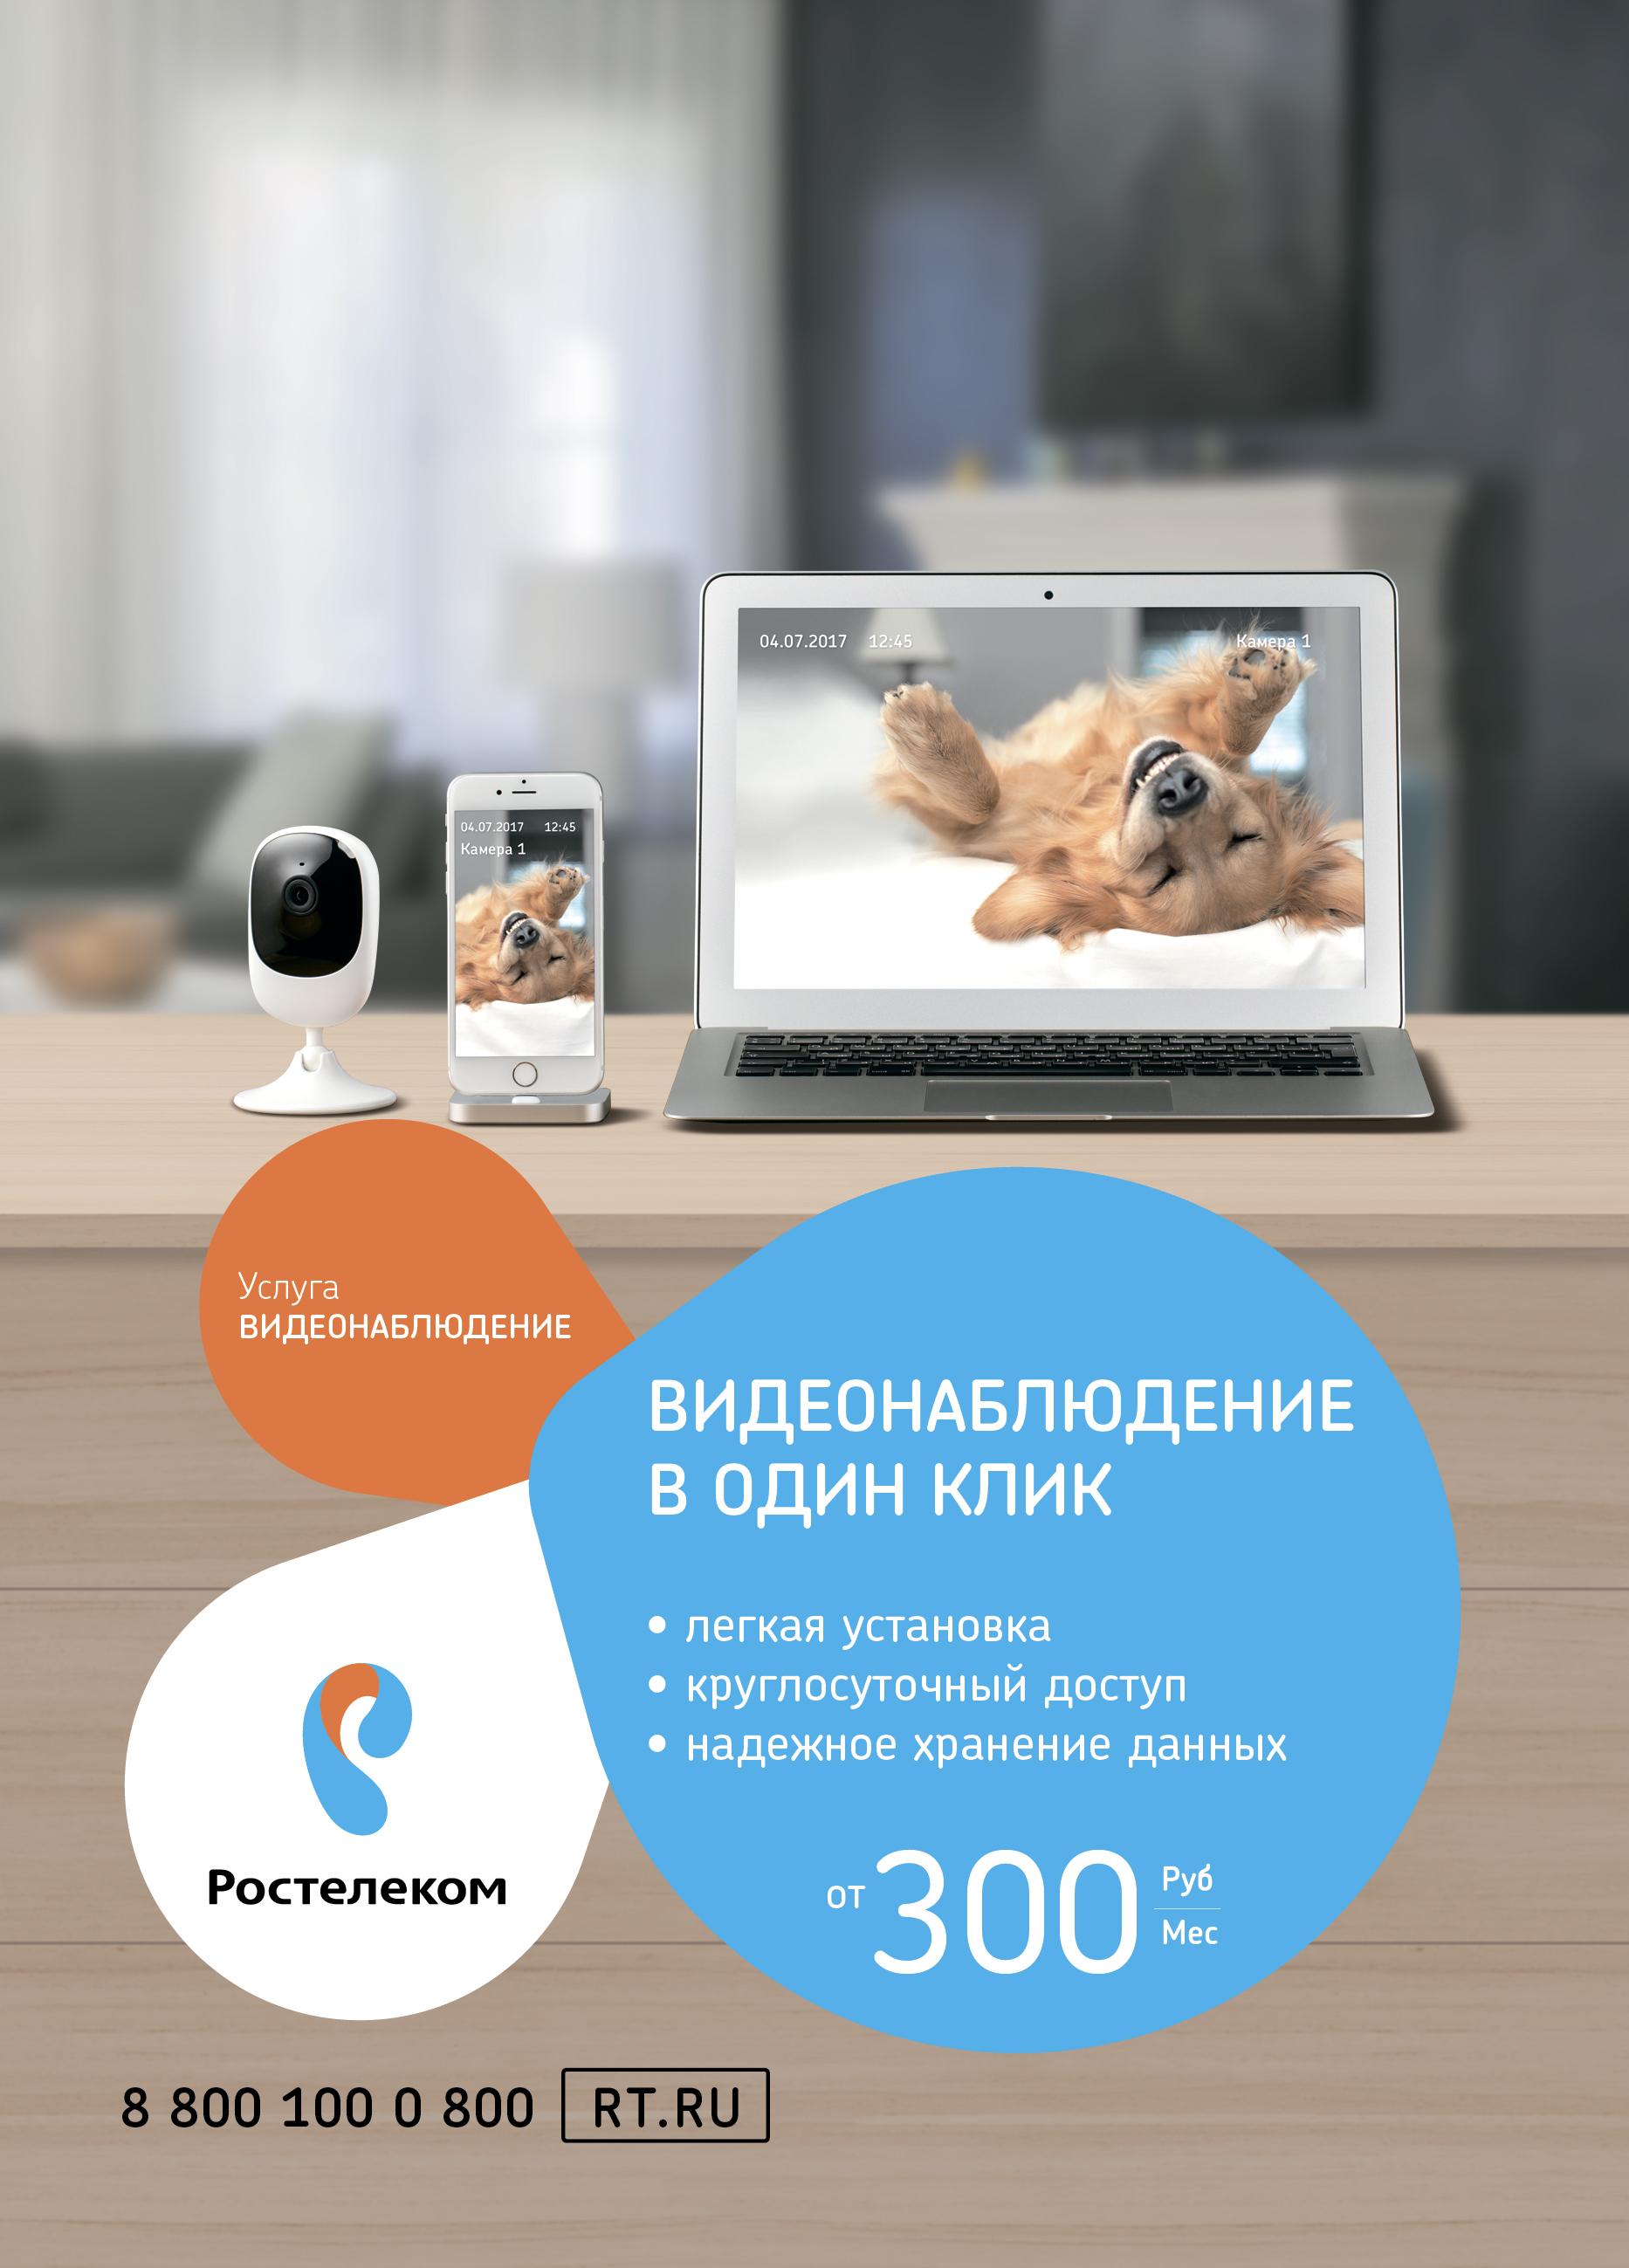 A5_Videonabludenie_297x420-poster